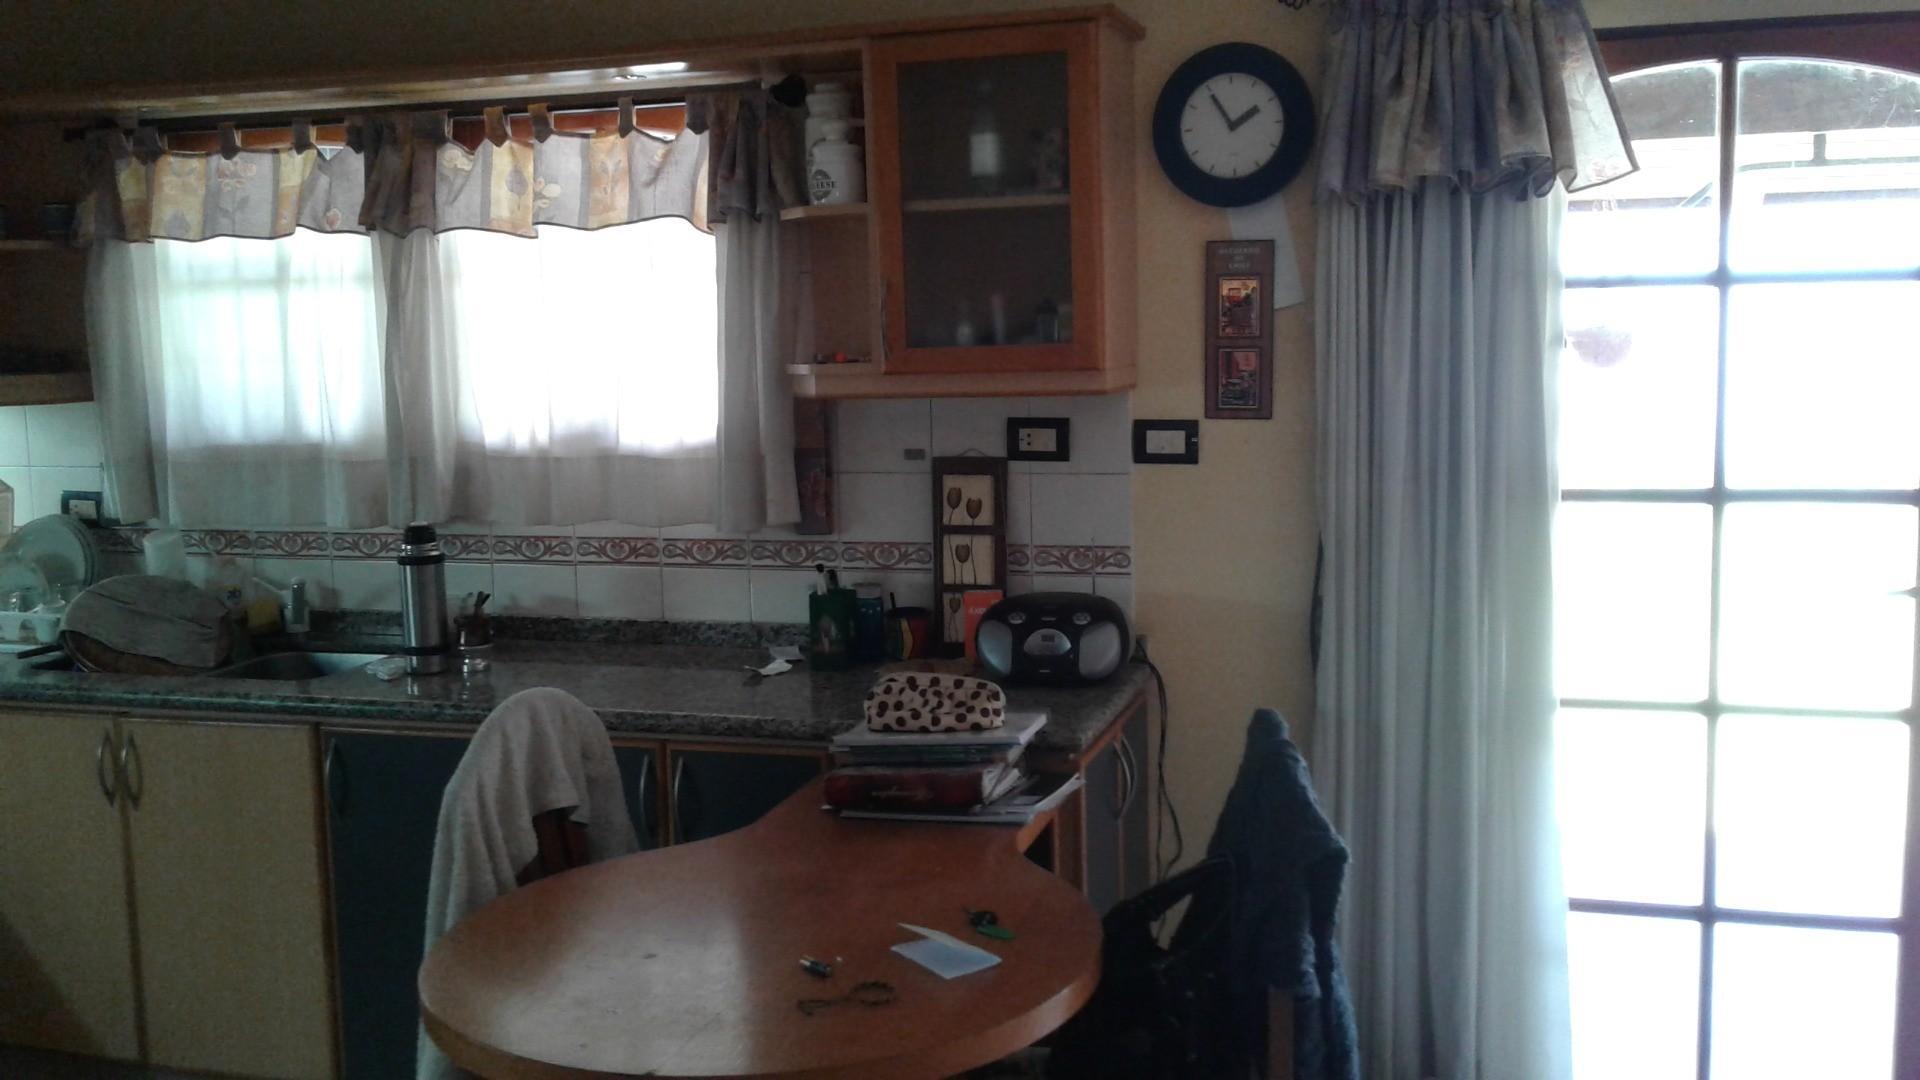 B° Liceo I , Vendo hermosa casa, excelente ubicación. Tres dormitorios, cochera, patio.